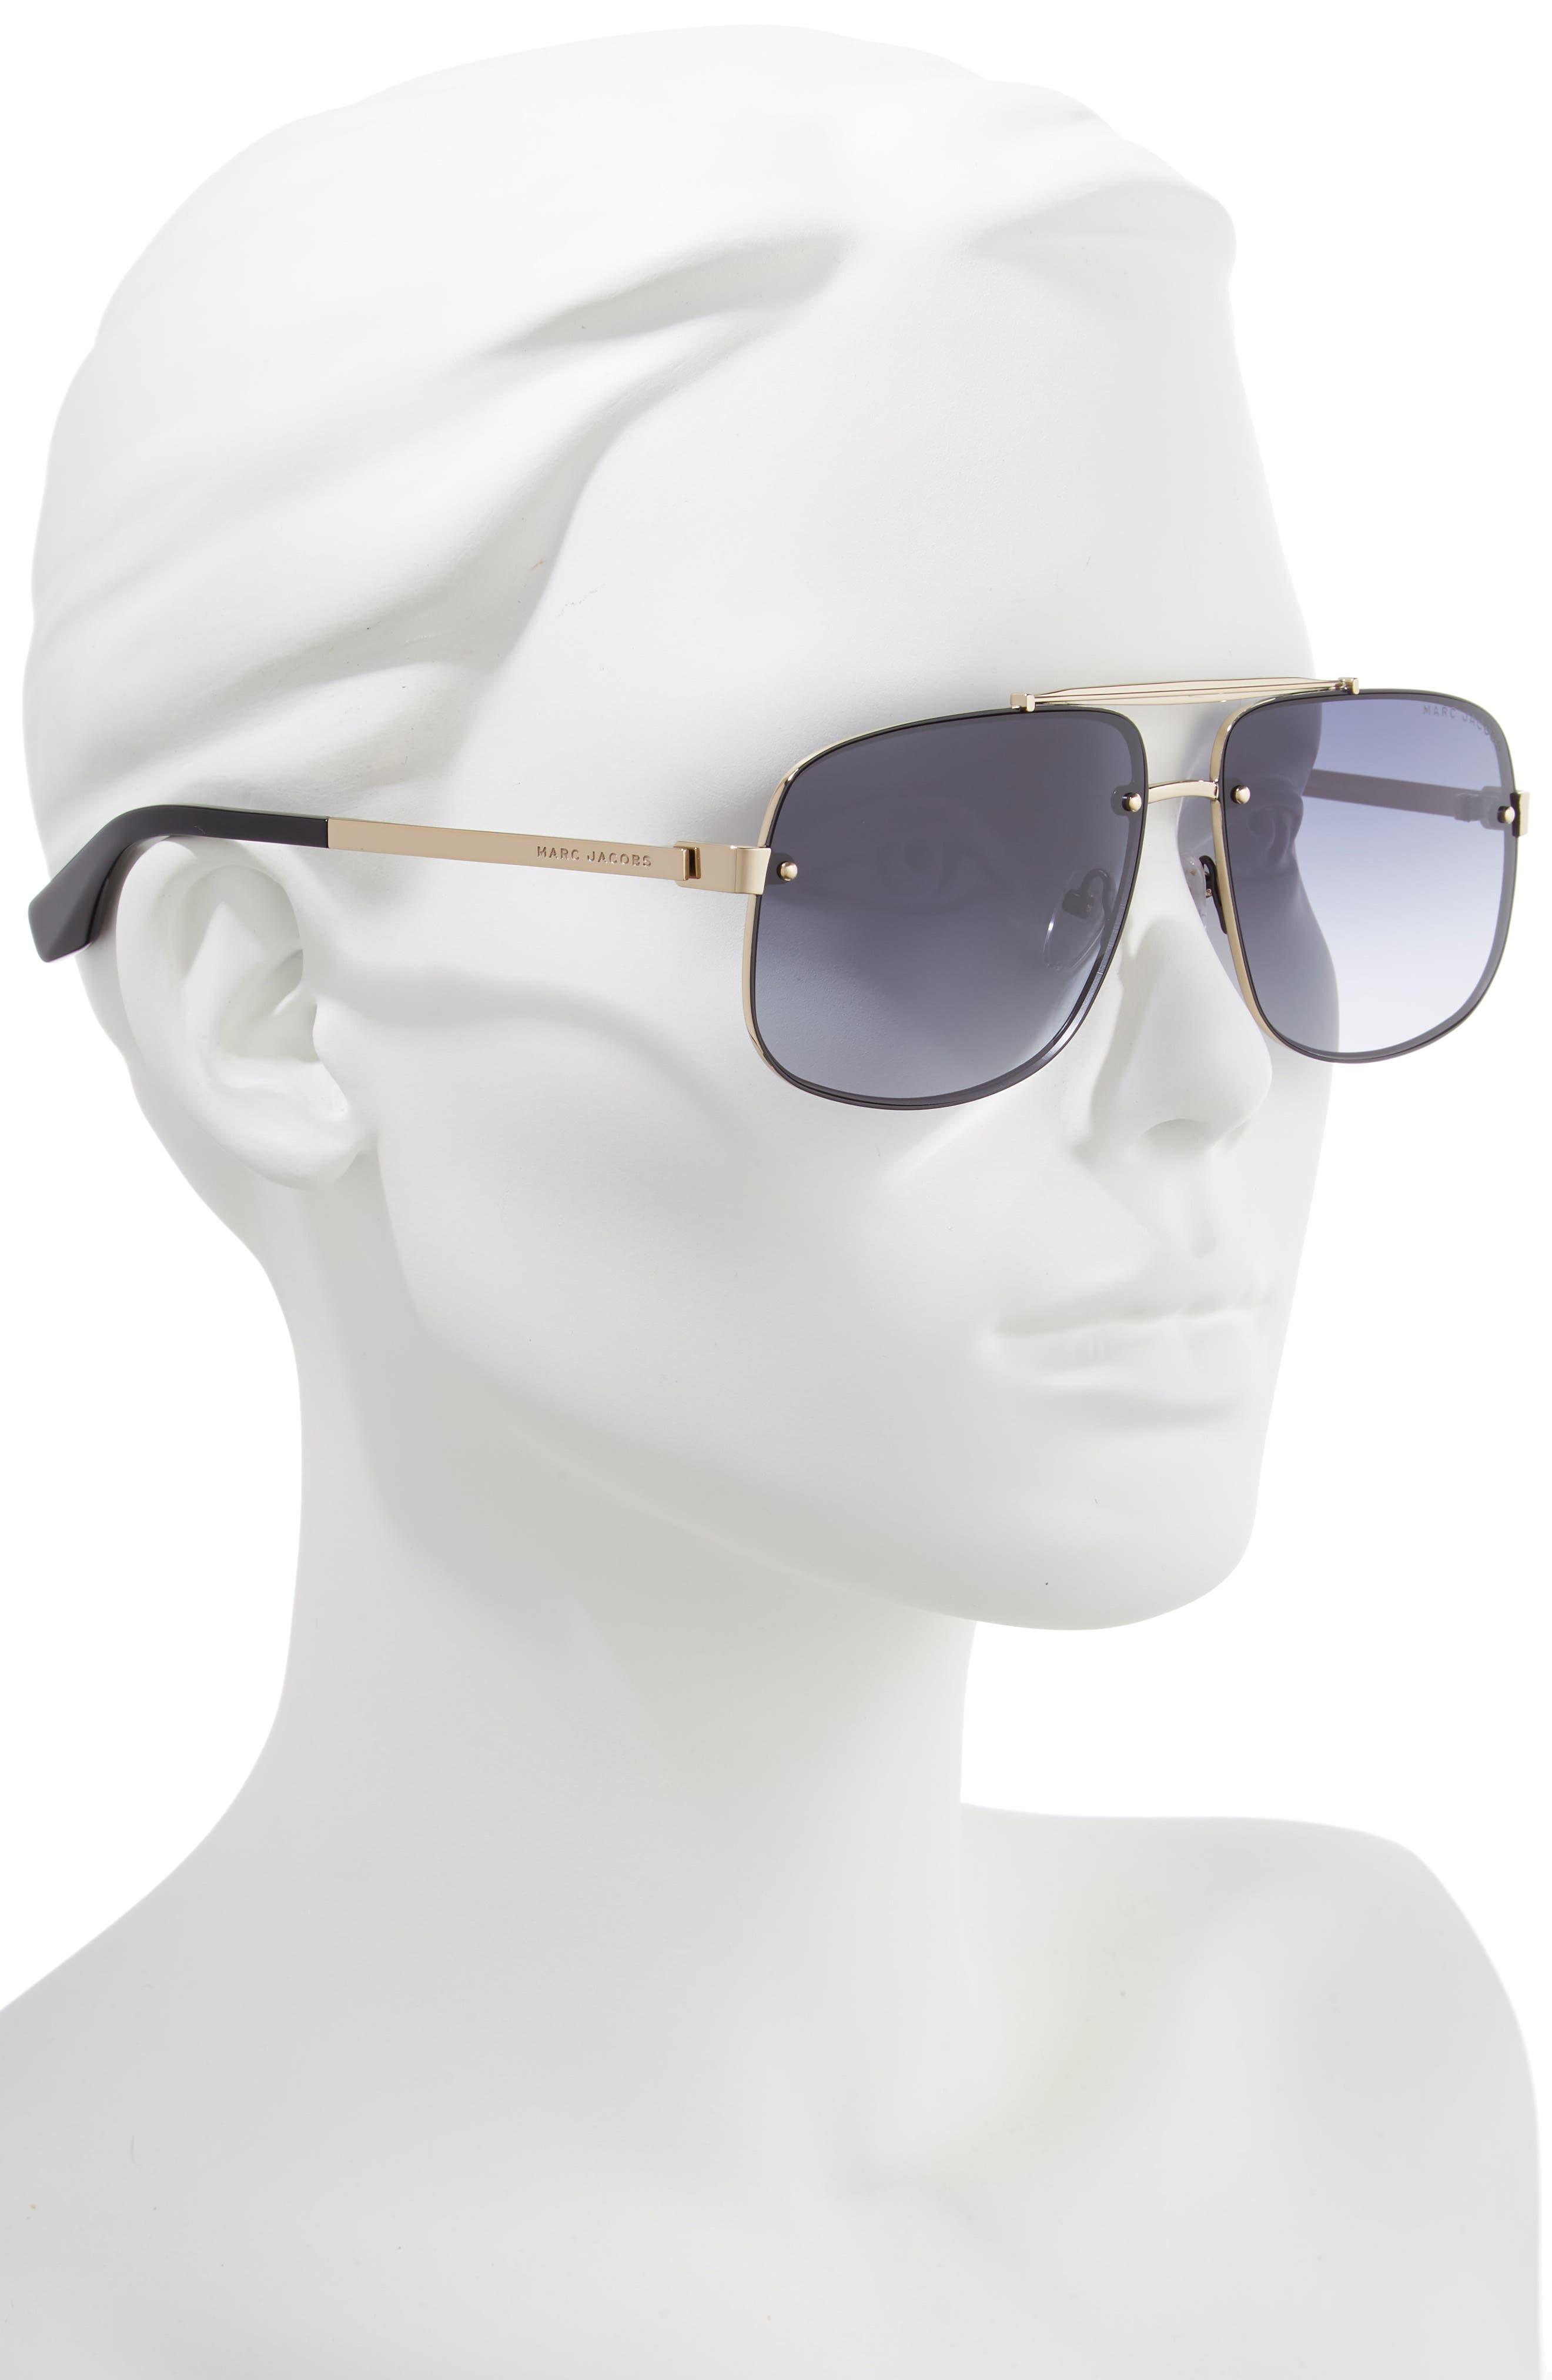 61mm Navigator Sunglasses,                             Alternate thumbnail 2, color,                             BLACK/ GOLD